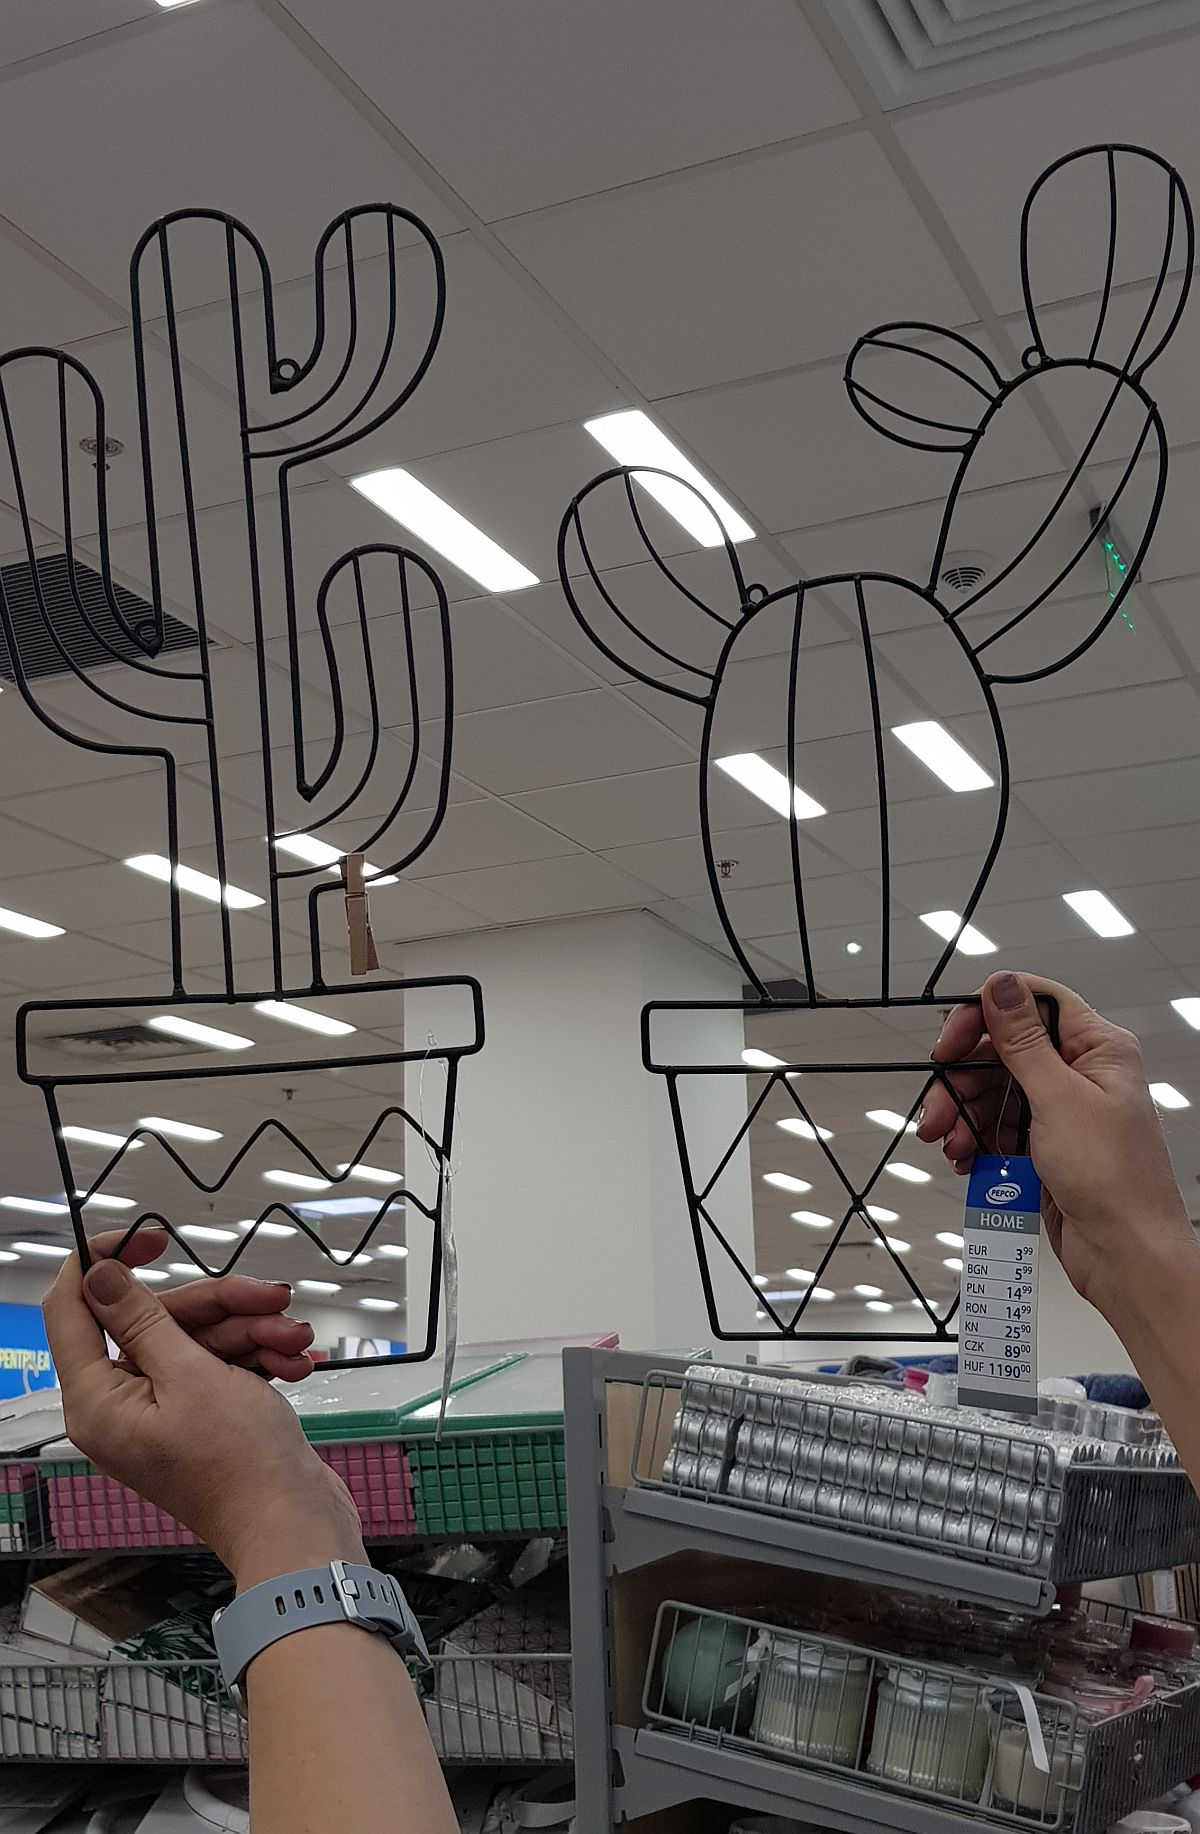 adelaparvu.com despre decoratiuni la pret bun in magazinePepco